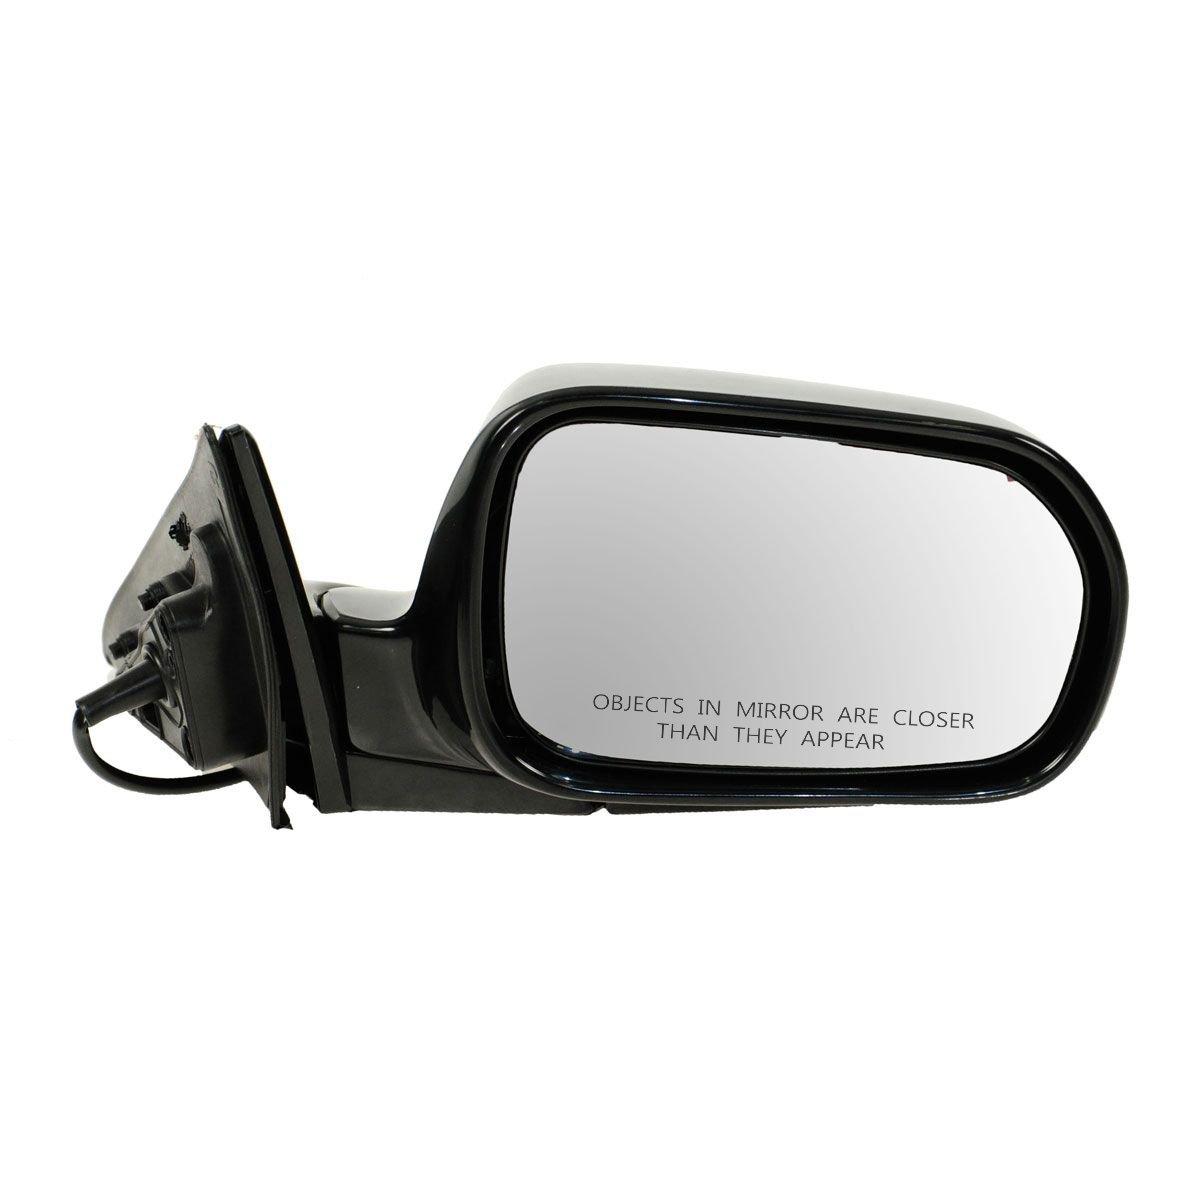 2002 2003 Subaru Impreza WRX Side View Mirror Assembly Left Driver LH 02 03